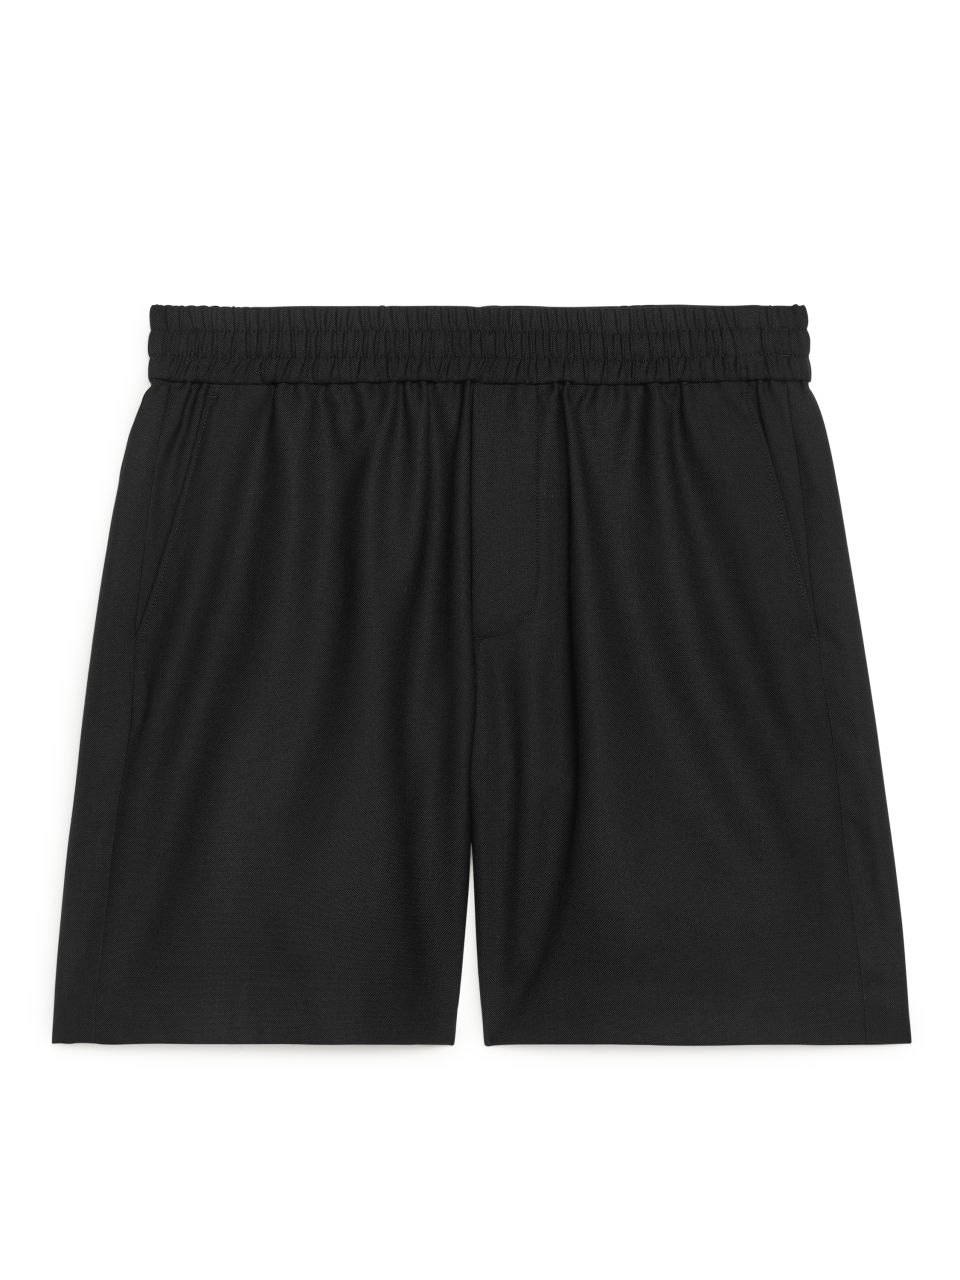 Wool-Blend Drawstring Shorts - Black